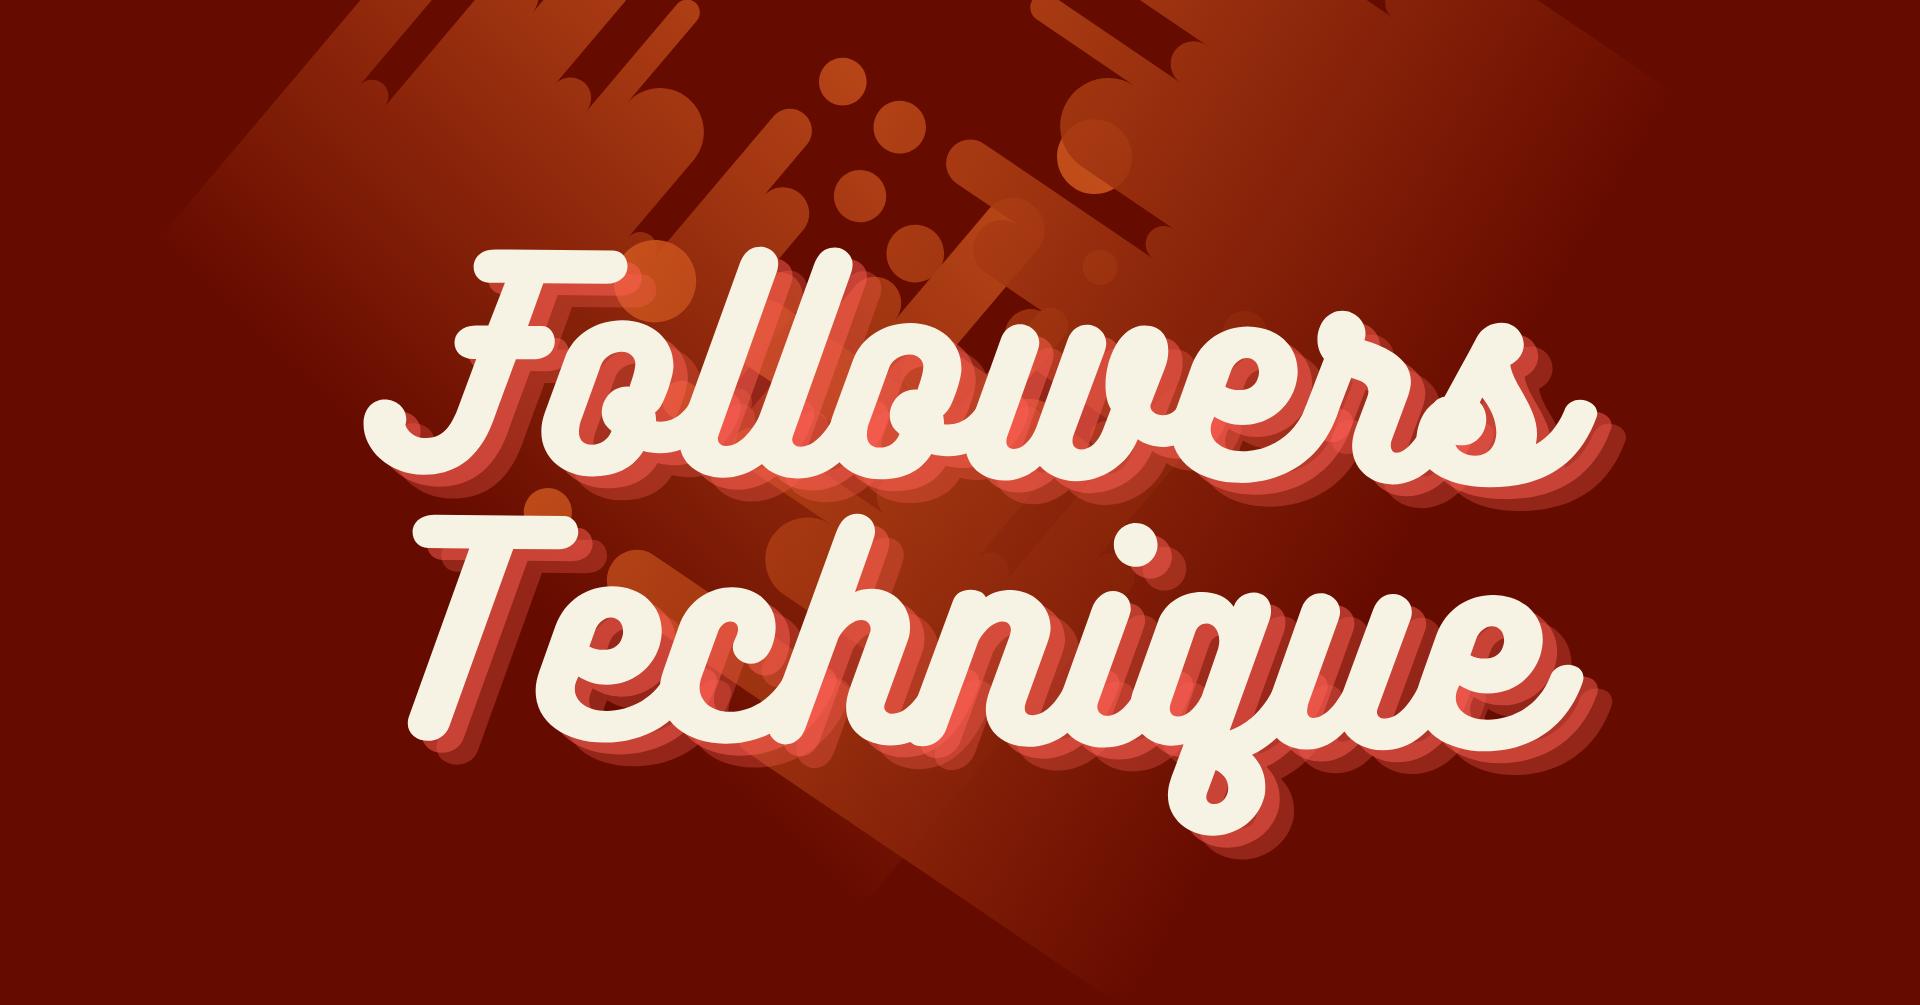 Followers Courses